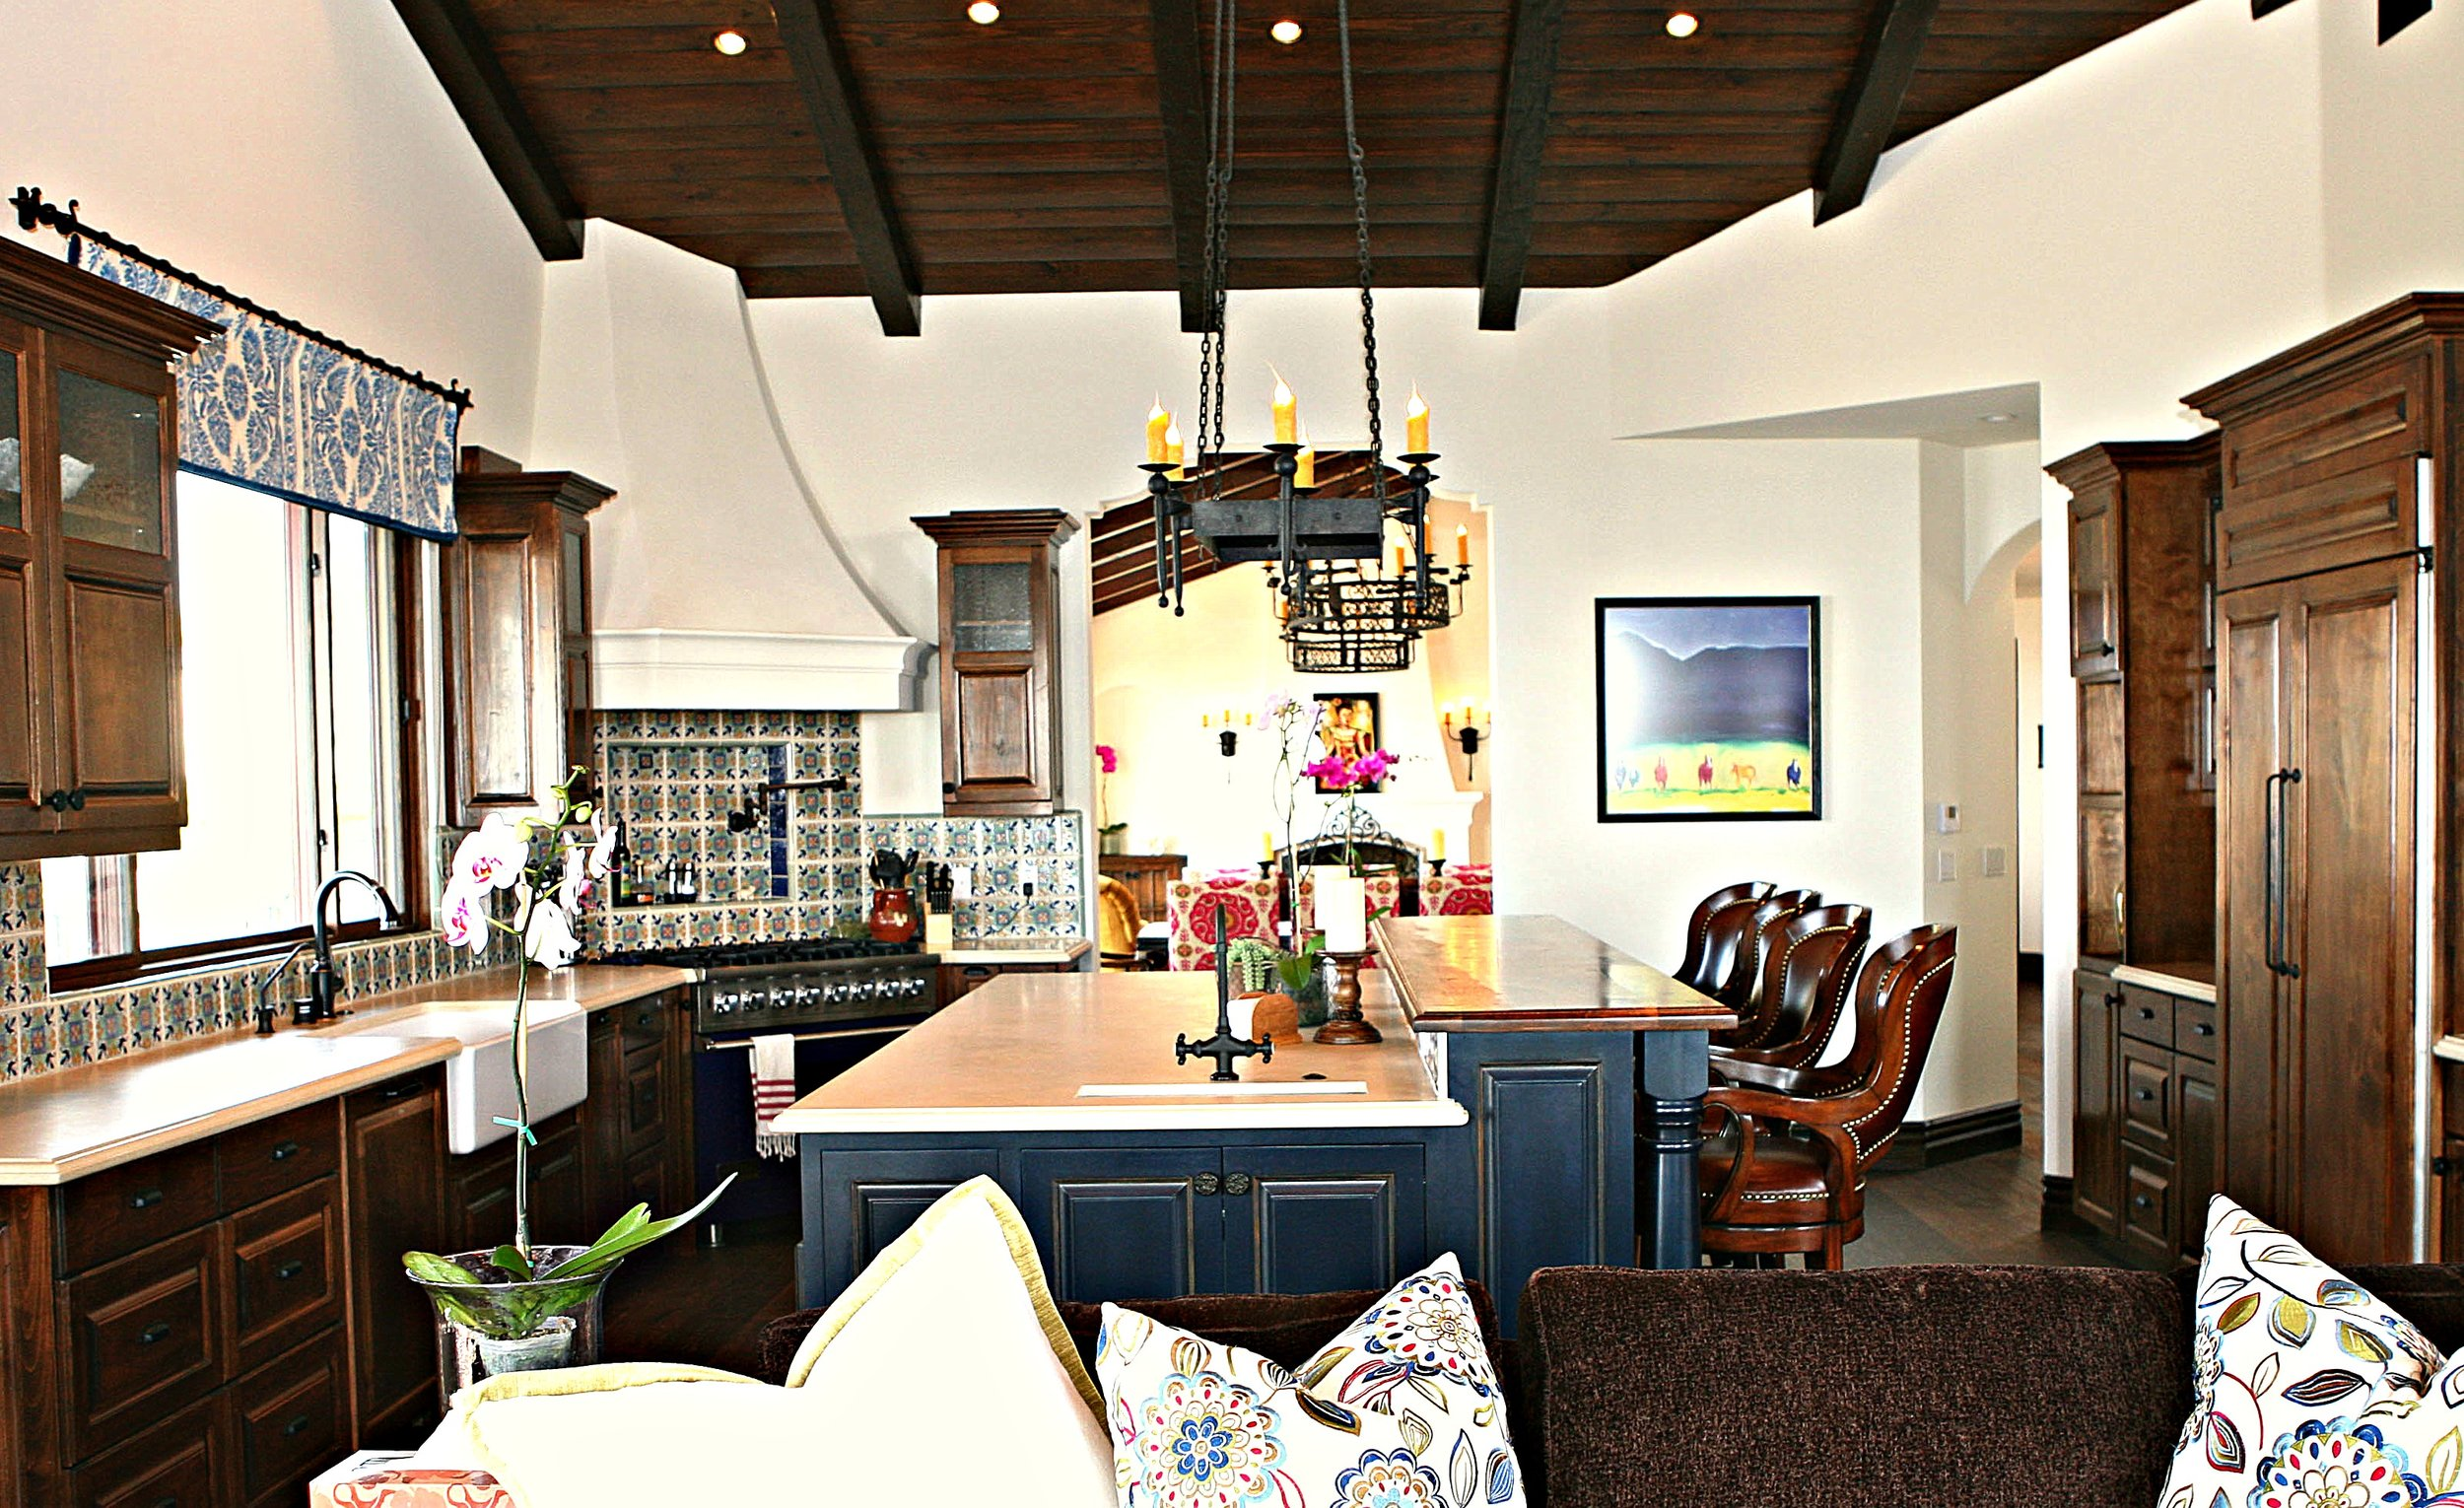 1704-Family-kitchen-1.jpg